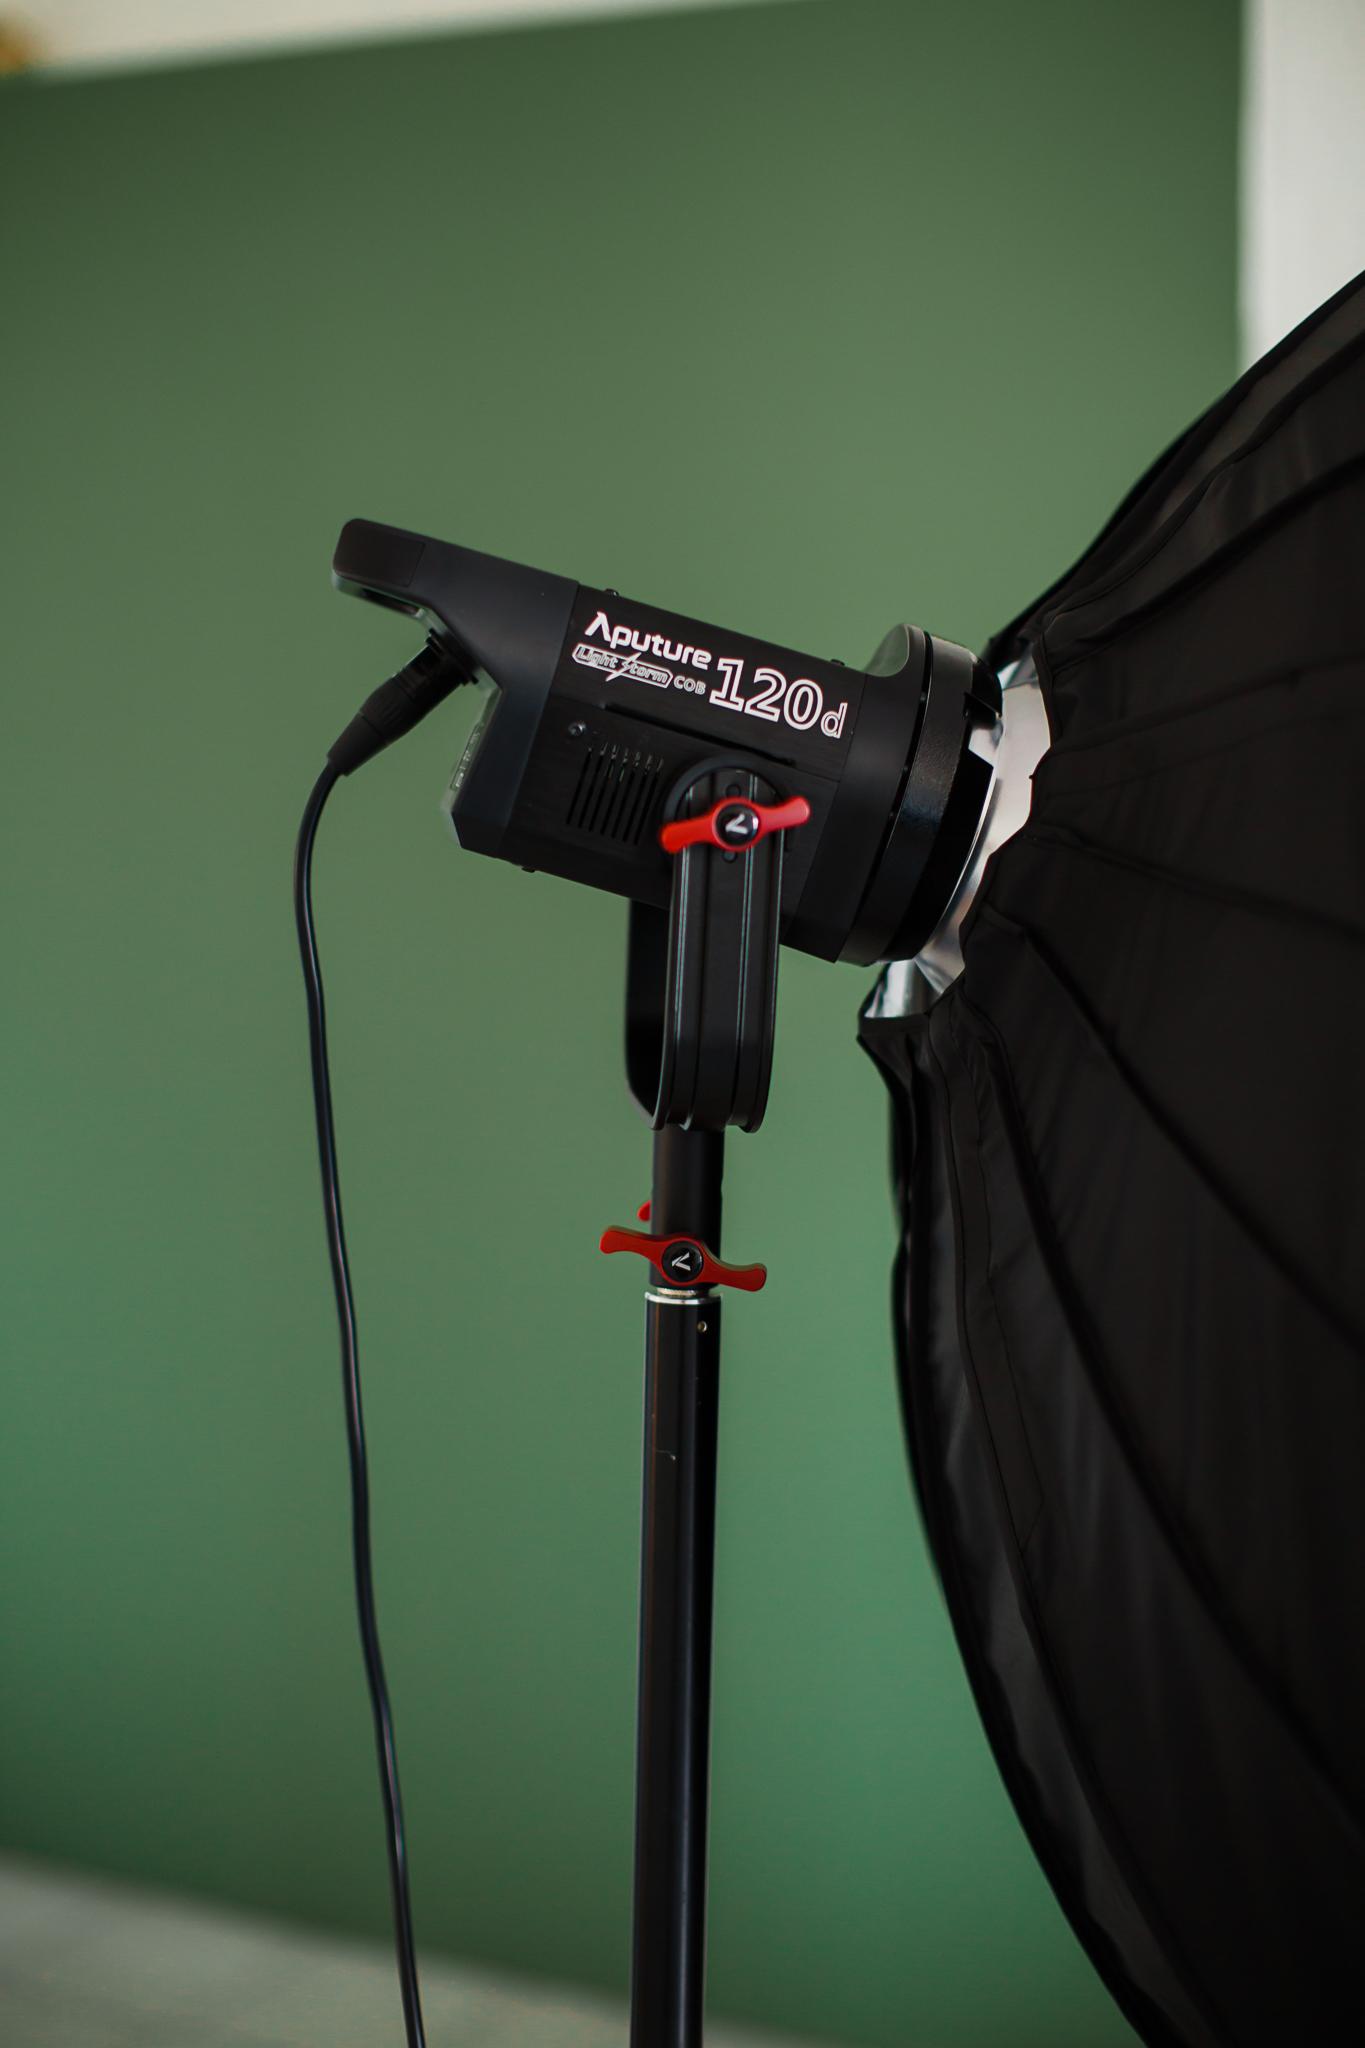 Studio-31.jpg